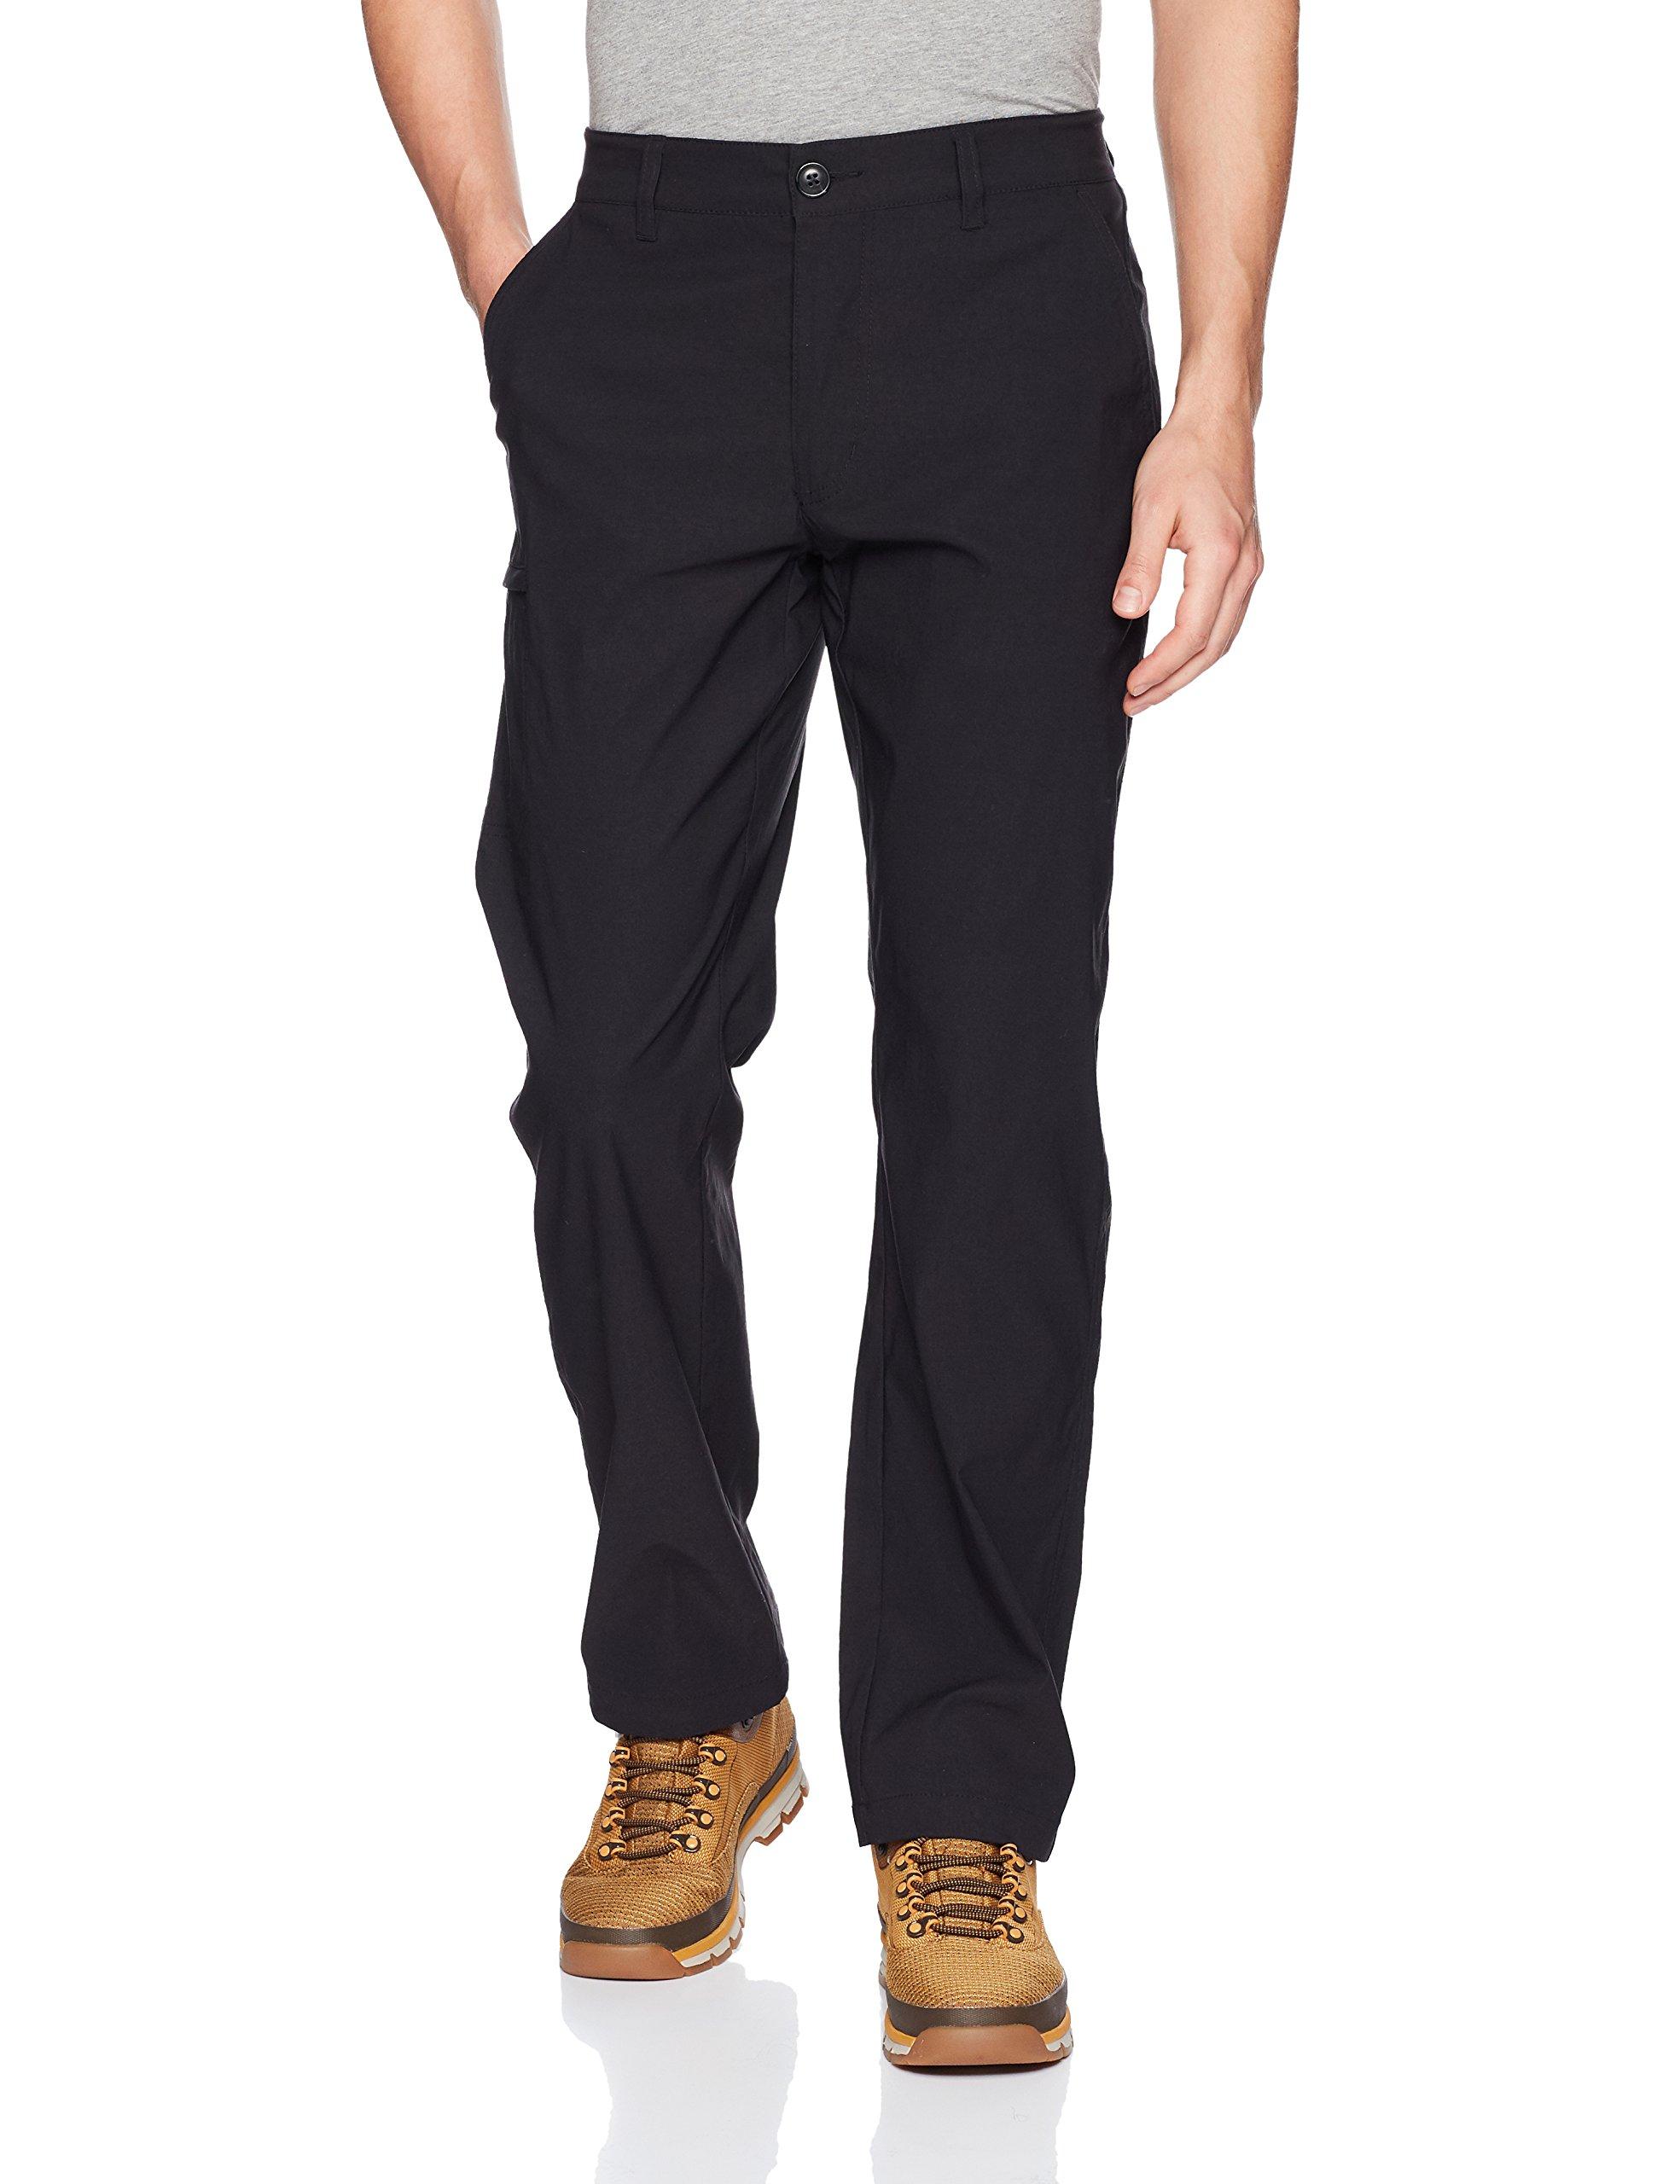 UNIONBAY Men's Rainier Lightweight Comfort Travel Tech Chino Pants, Black, 34x32